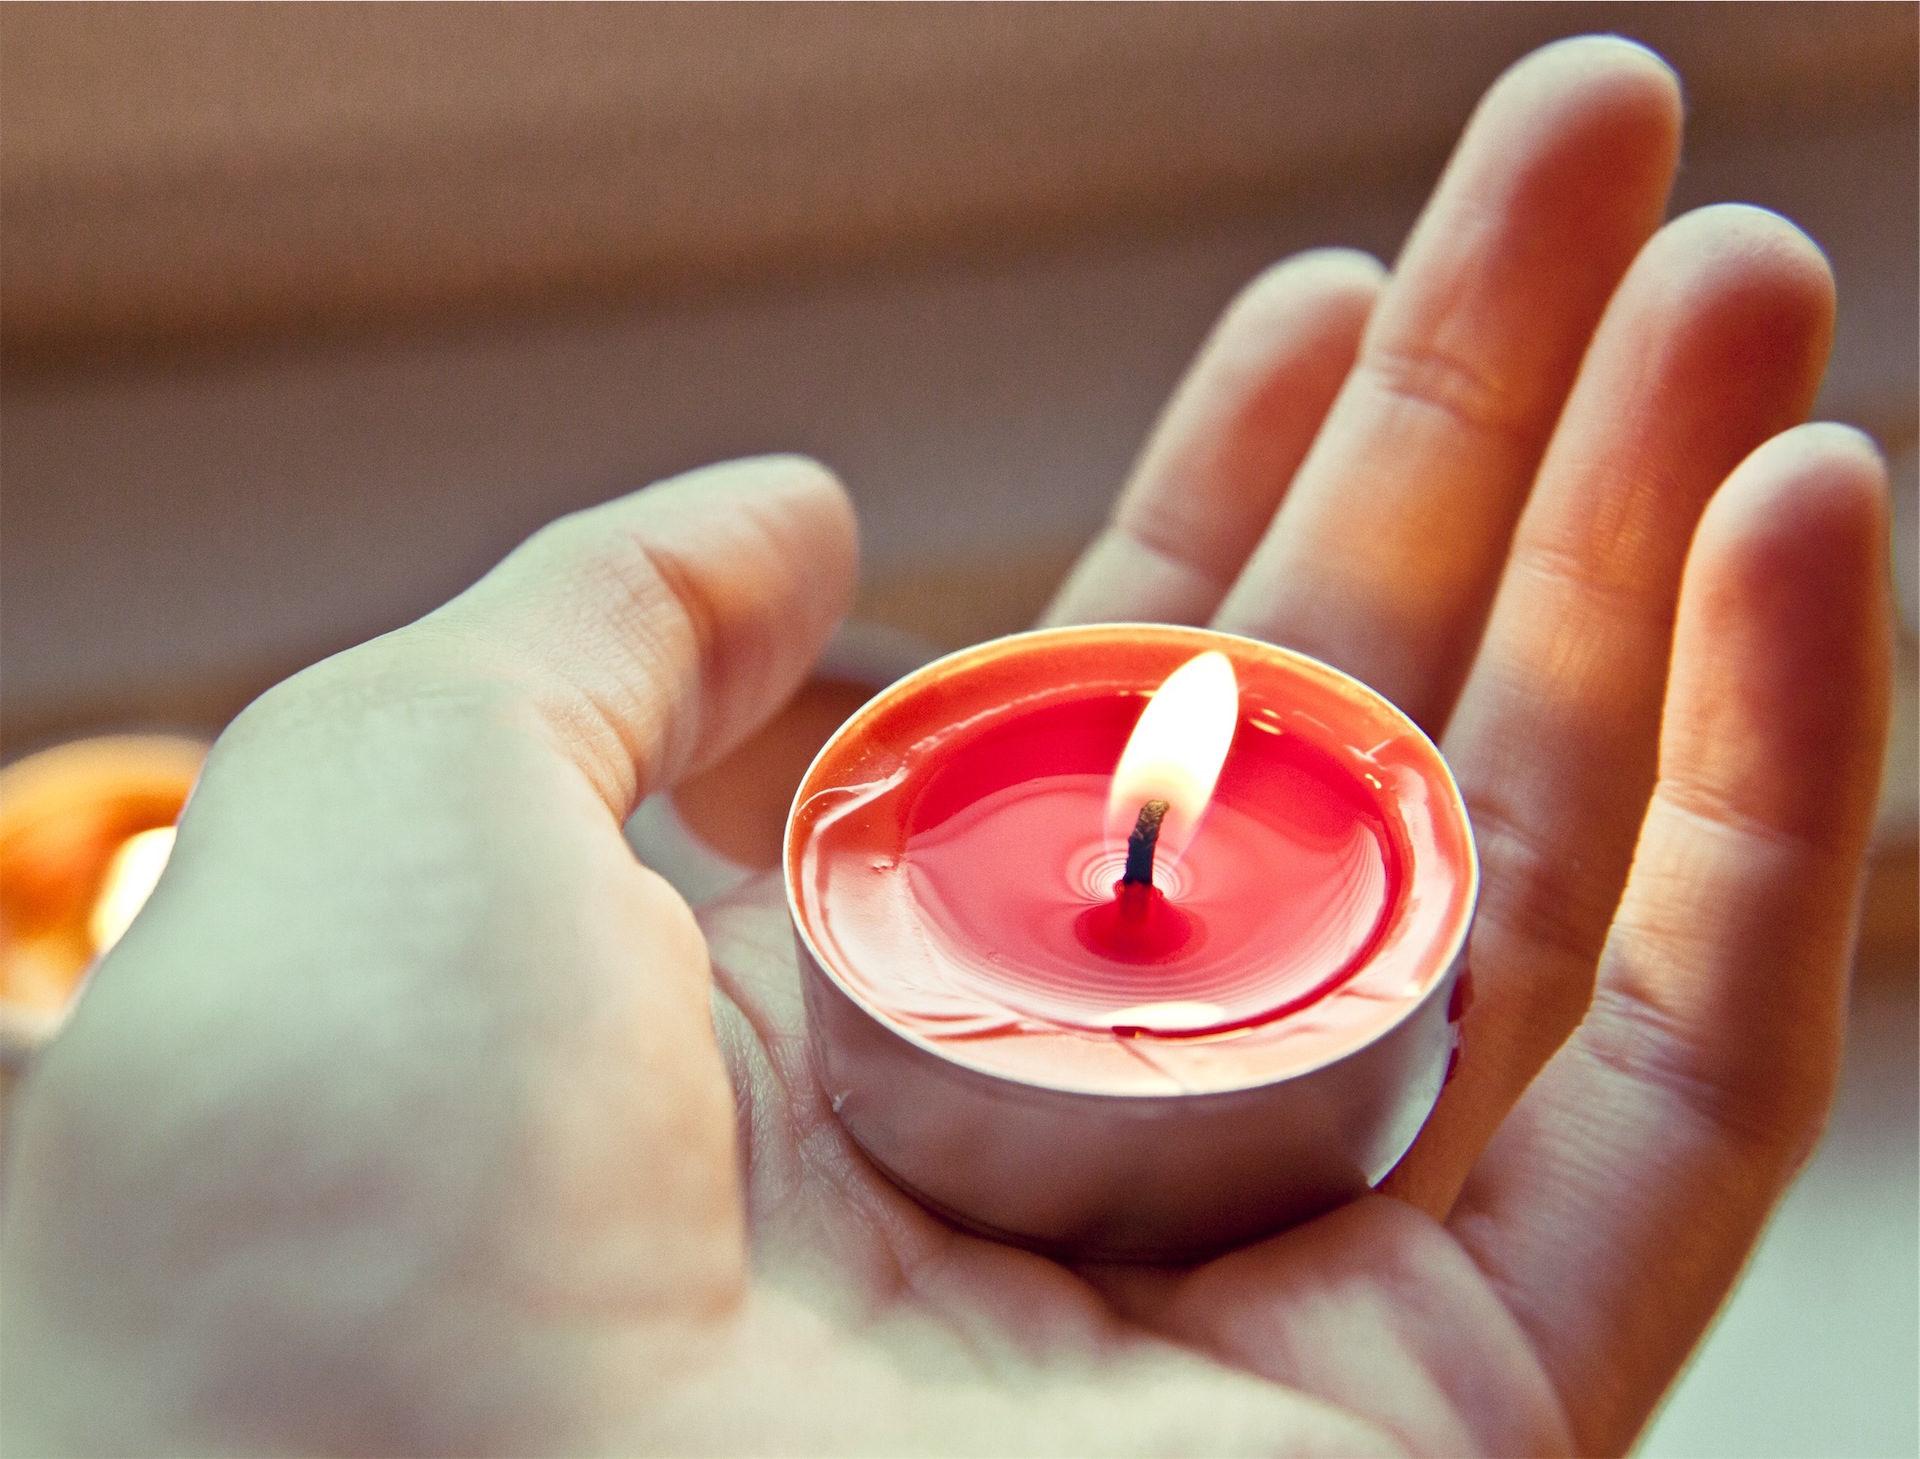 main, bougie, feu, flamme, Rouge - Fonds d'écran HD - Professor-falken.com